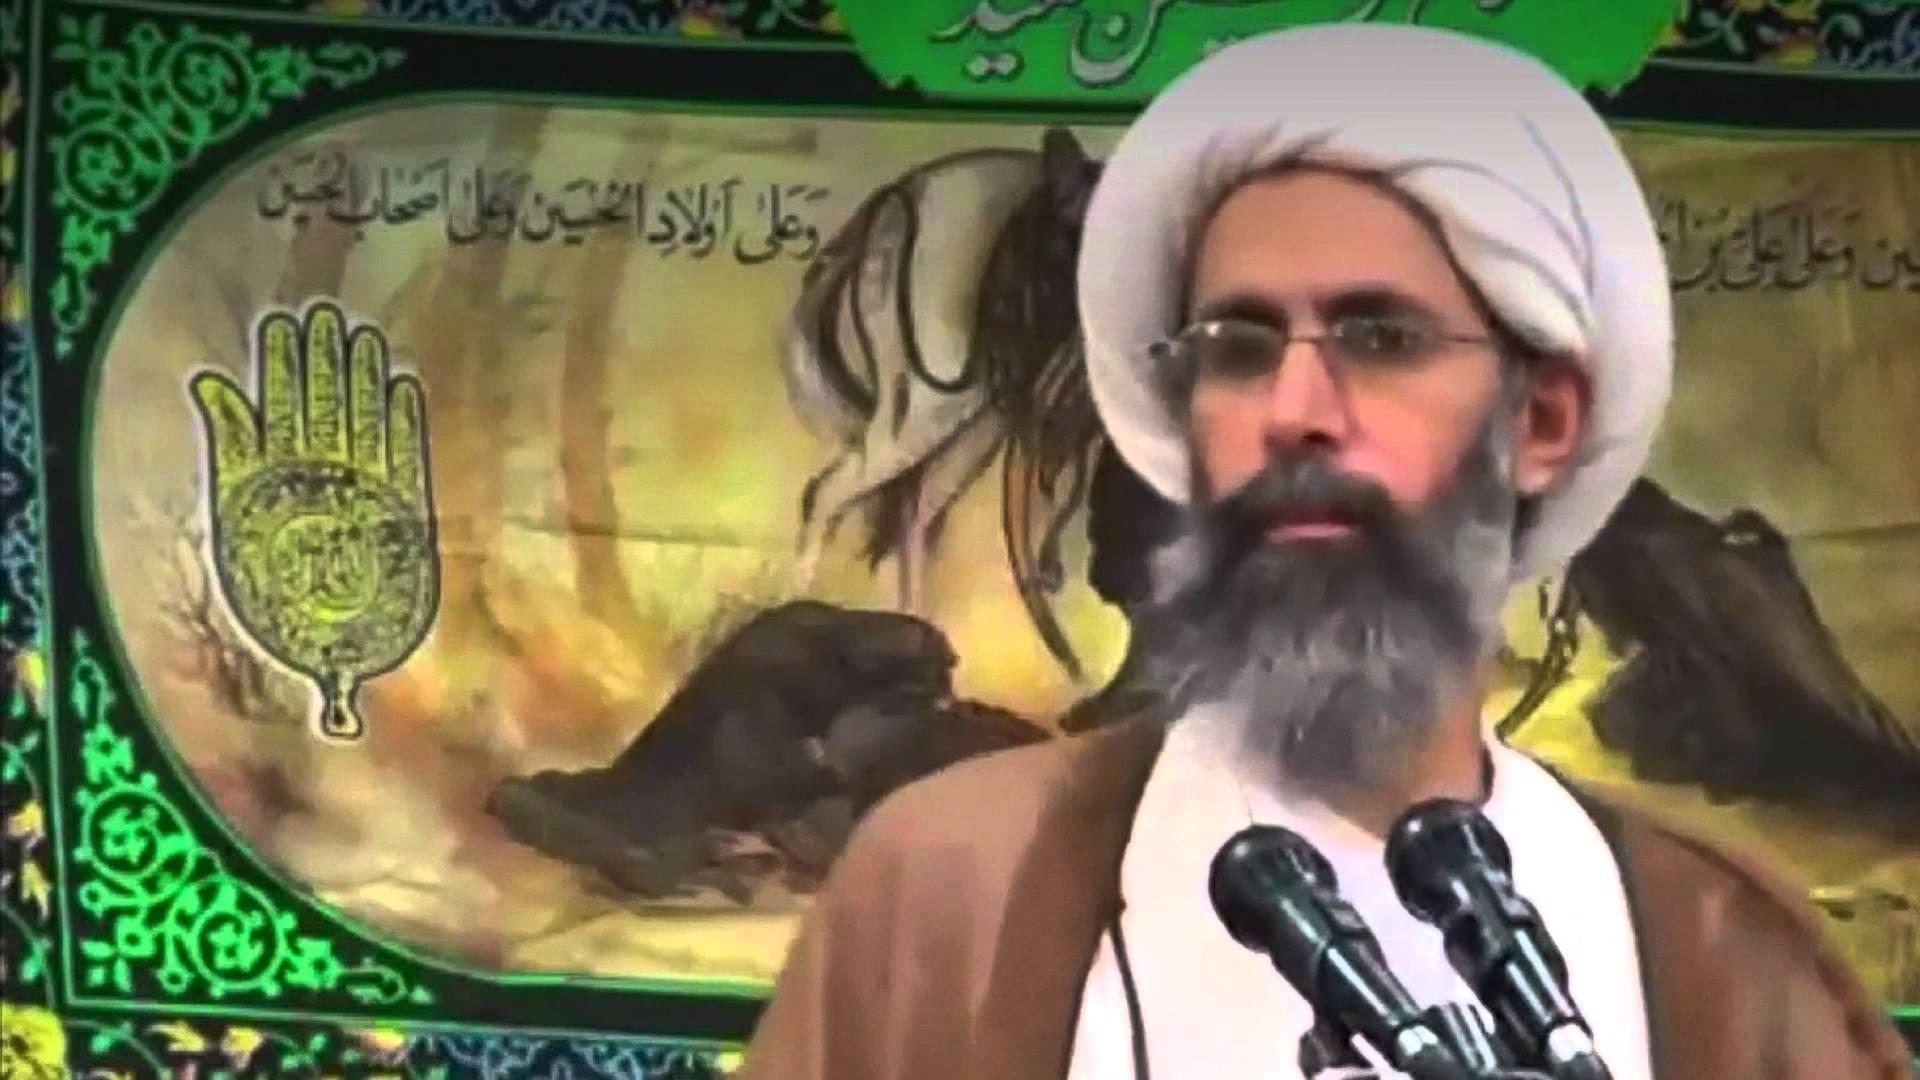 Sheikh-nimr-image2